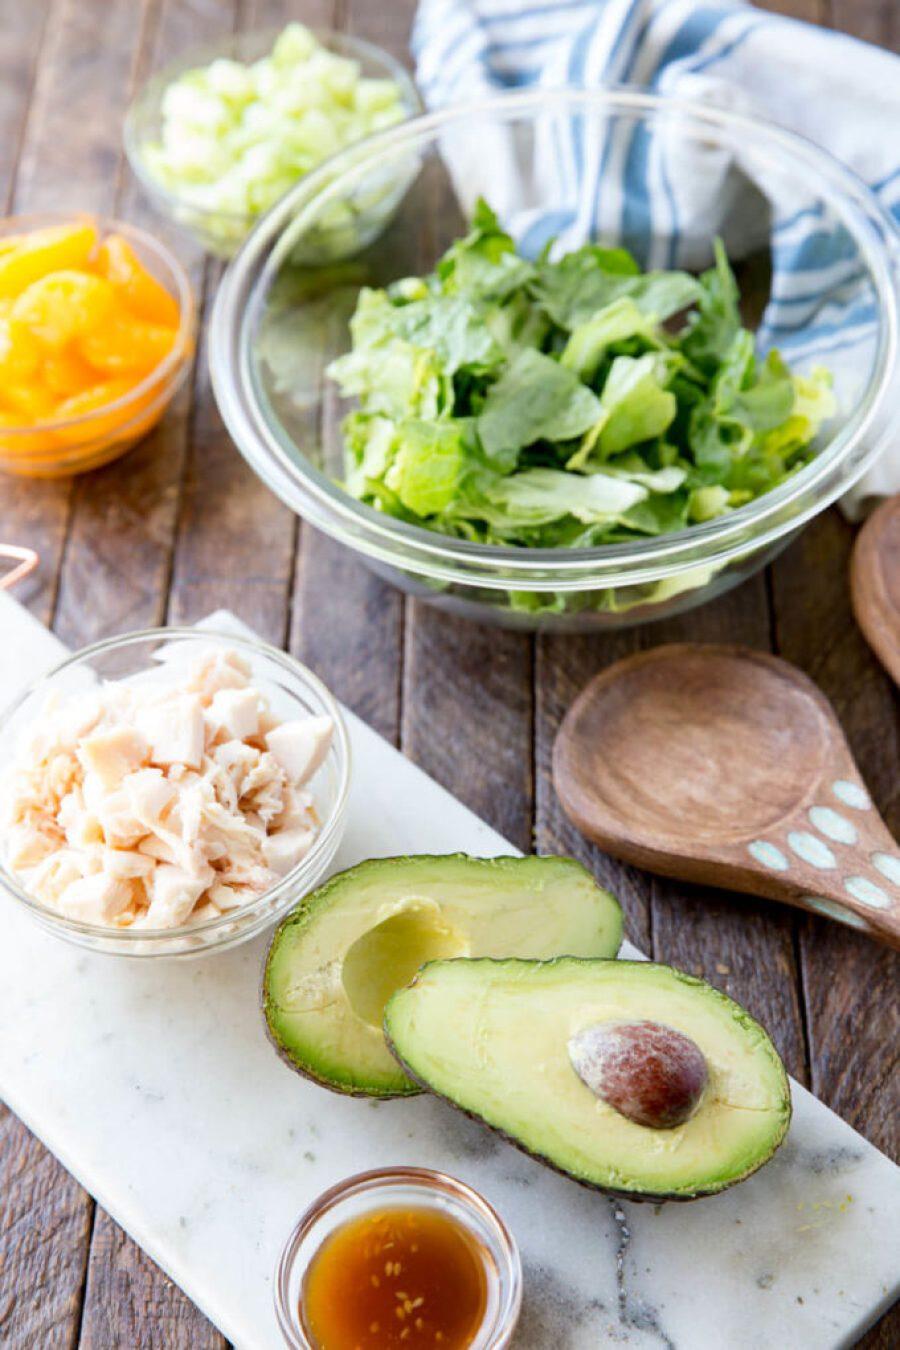 Avocado sesame ginger chicken salad